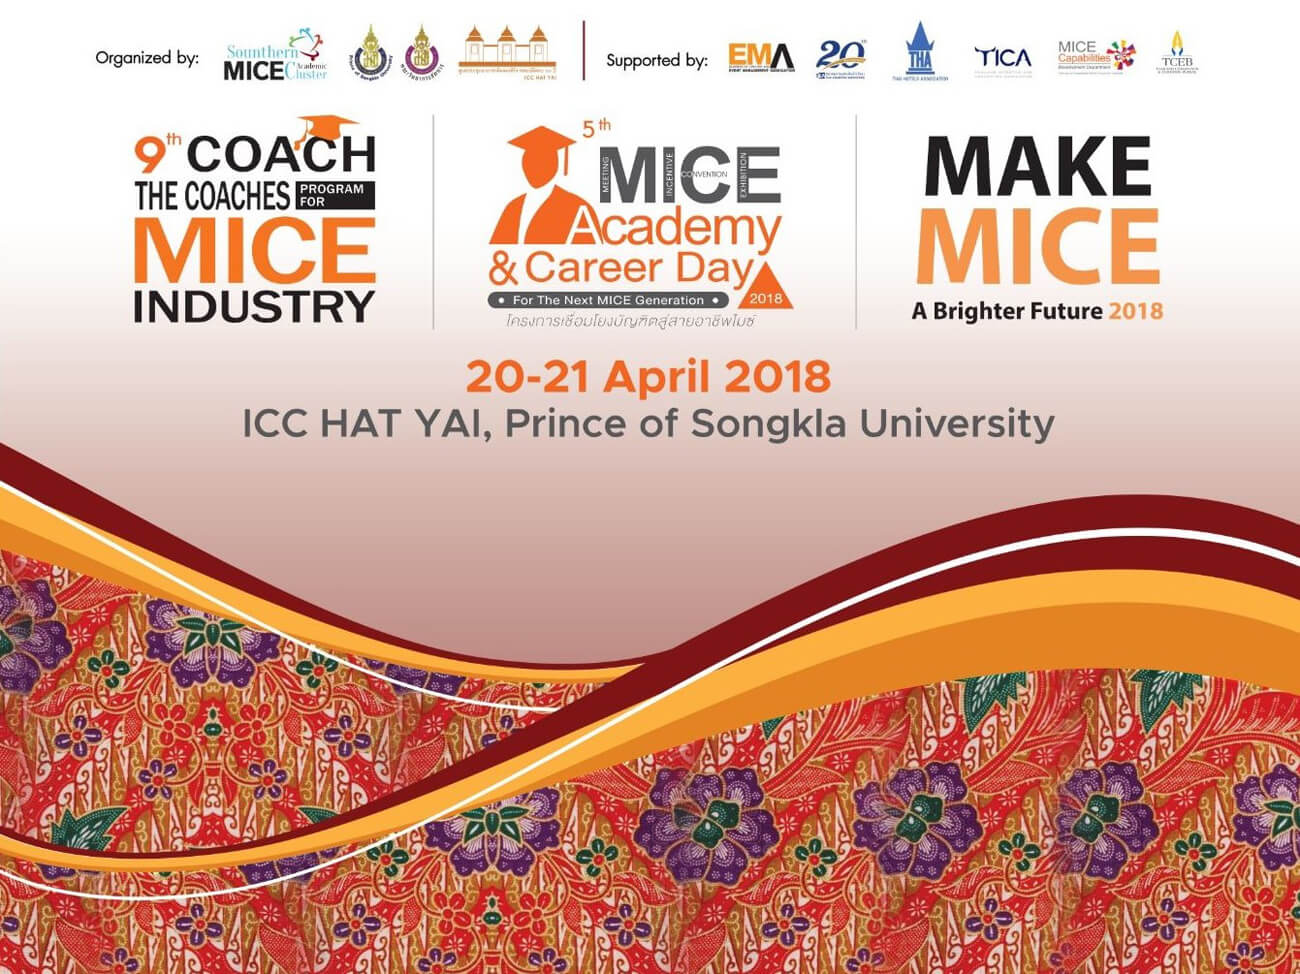 Coach the Coaches Program for MICE Industry 2018 ICC HATYAI ศูนย์ประชุมนานาชาติฉลองสิริราชสมบัติครบ ๖๐ ปี